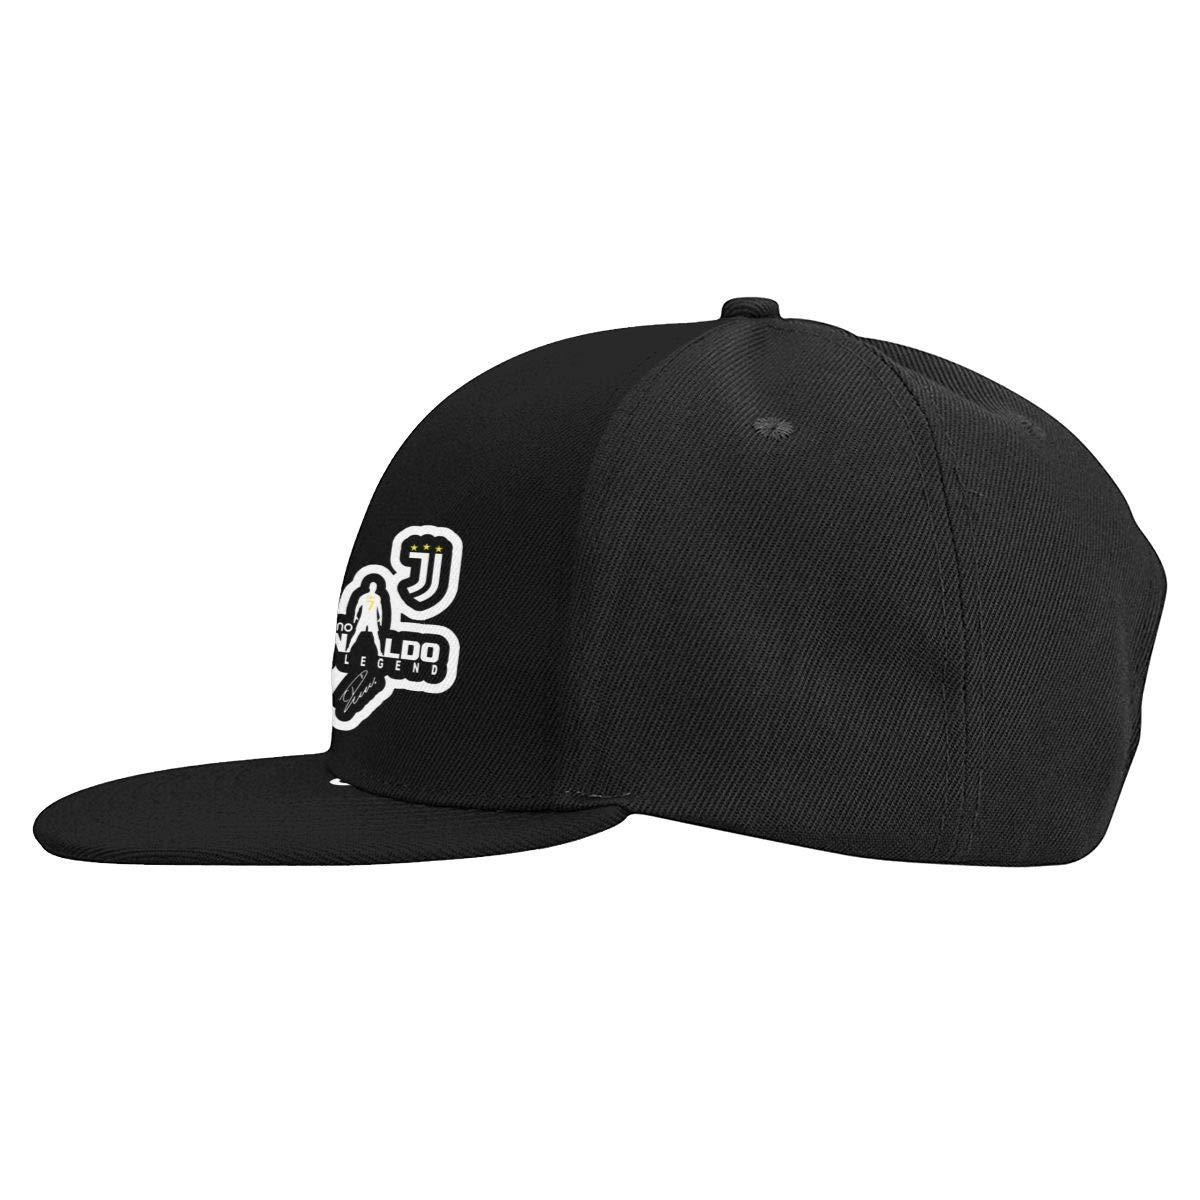 DeniCar Unisex Adjustable Baseball Caps Cristiano-Ronaldo-The Legend Skull Cap